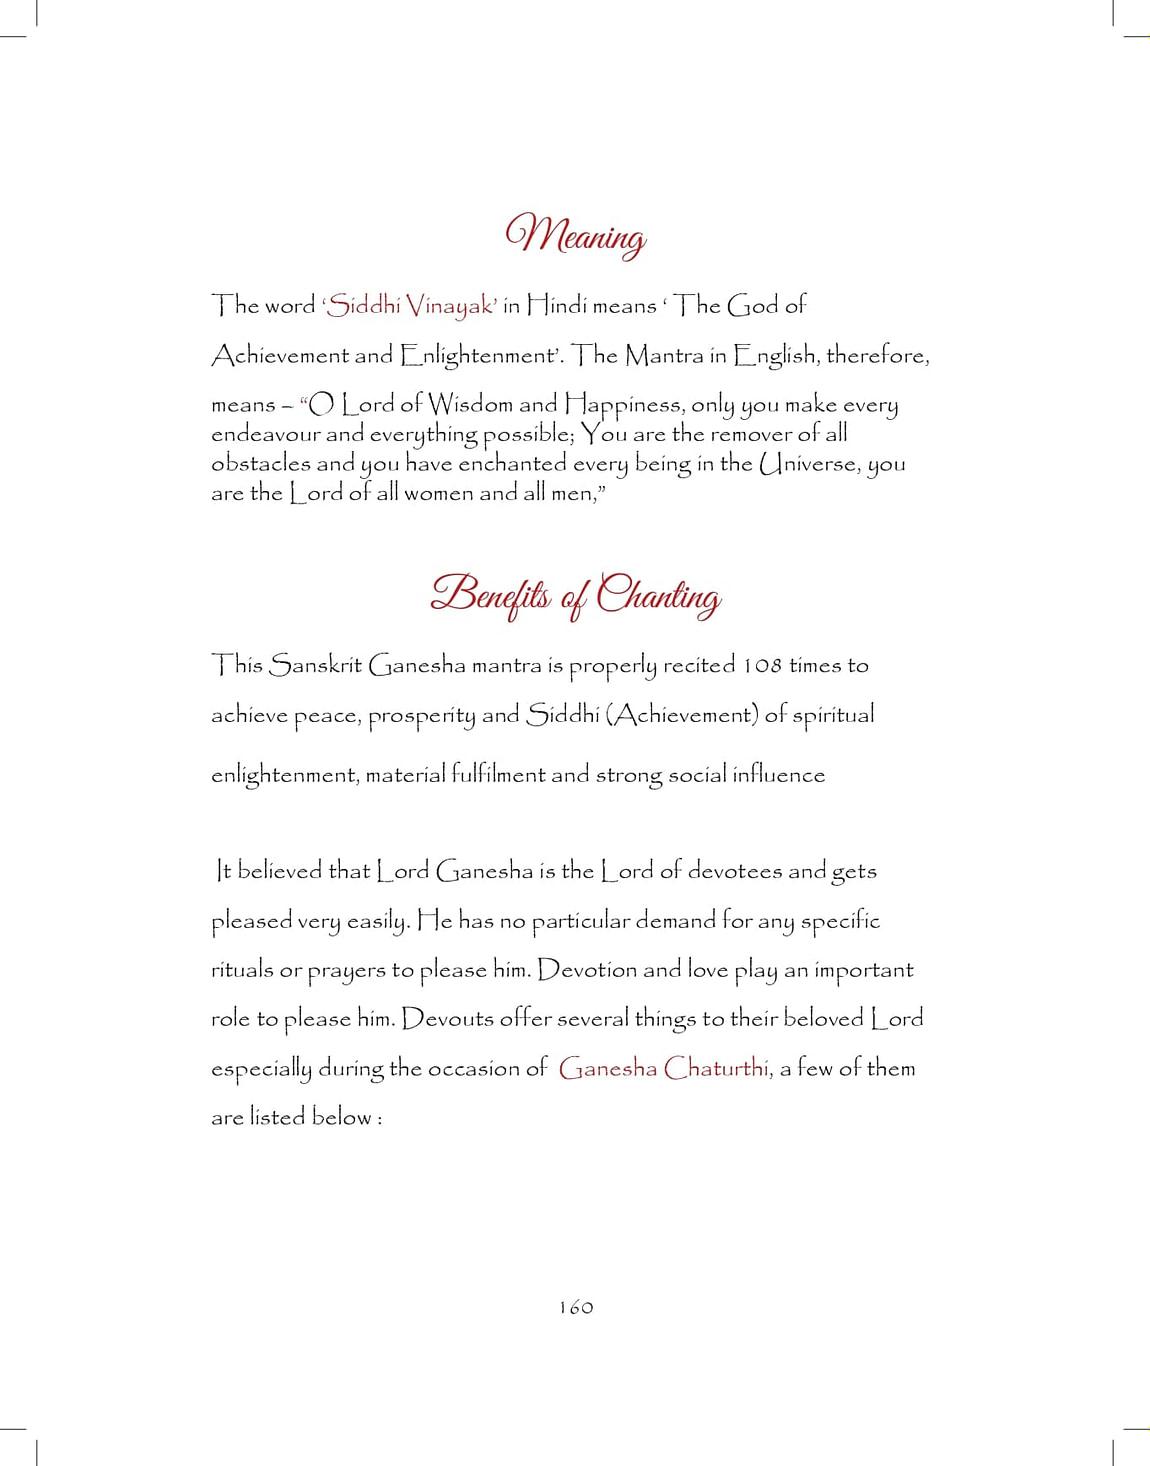 Ganesh-print_pages-to-jpg-0160.jpg